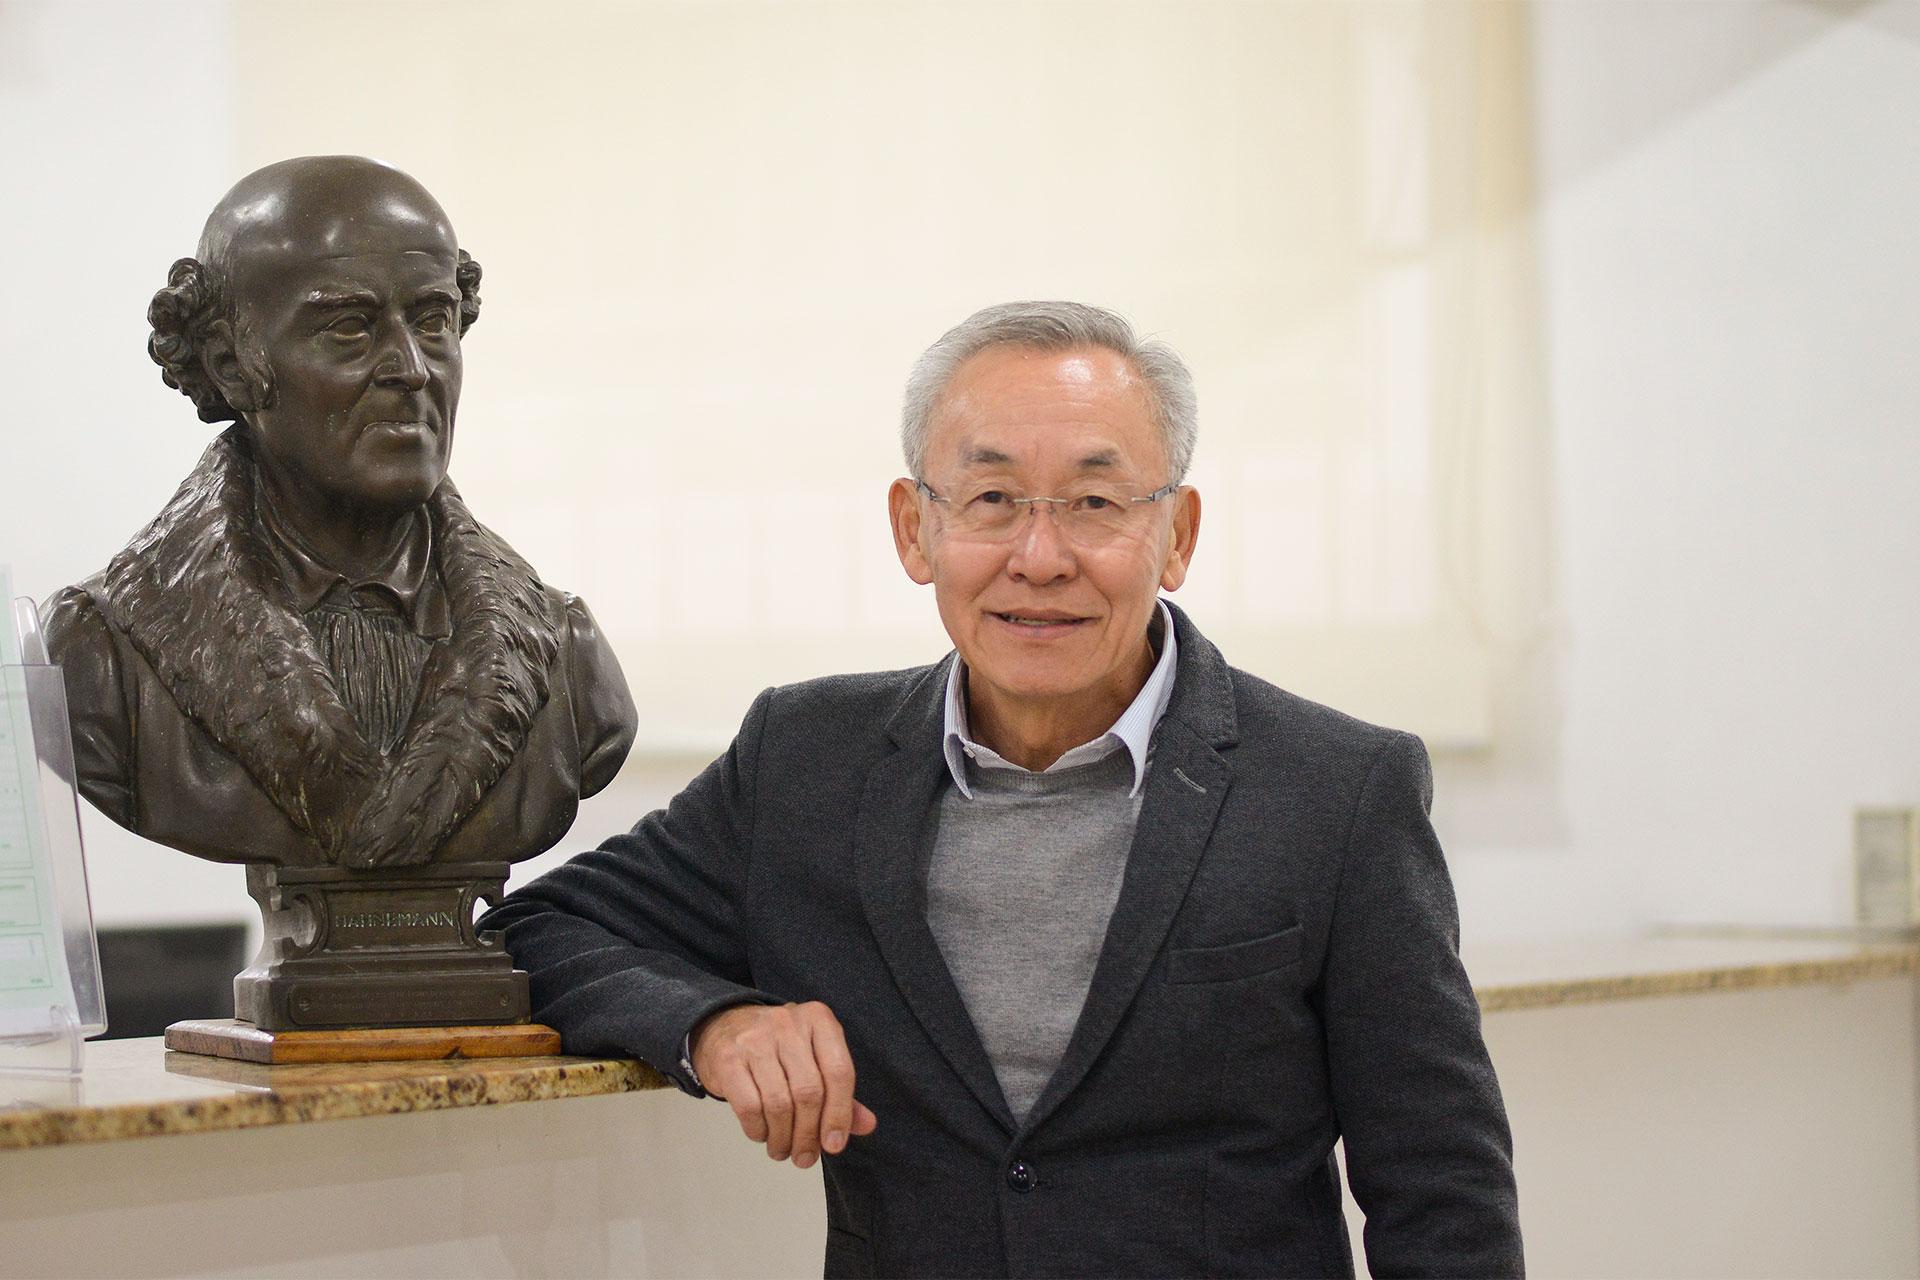 Sérgio Furuta, presidente da APH, com o busto de Hahnemann, pai da homeopatia